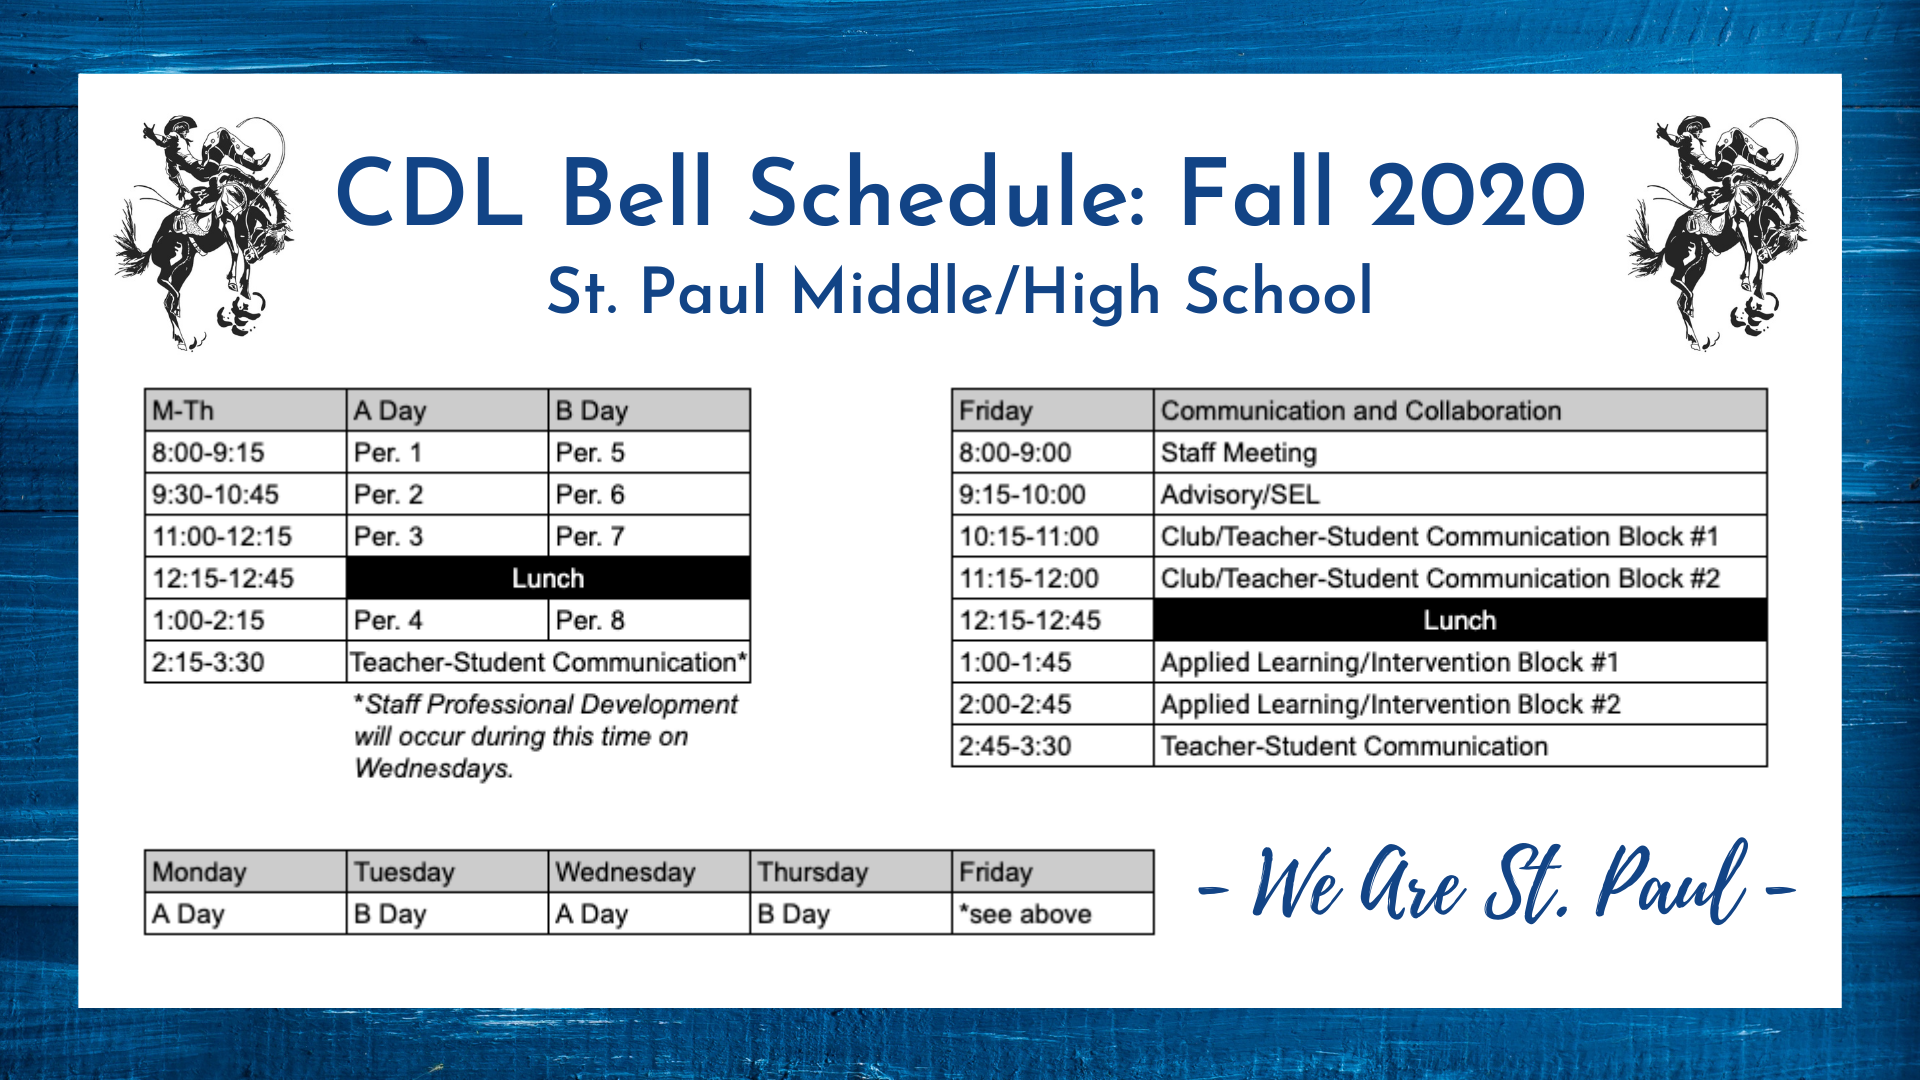 CDL Bell Schedule